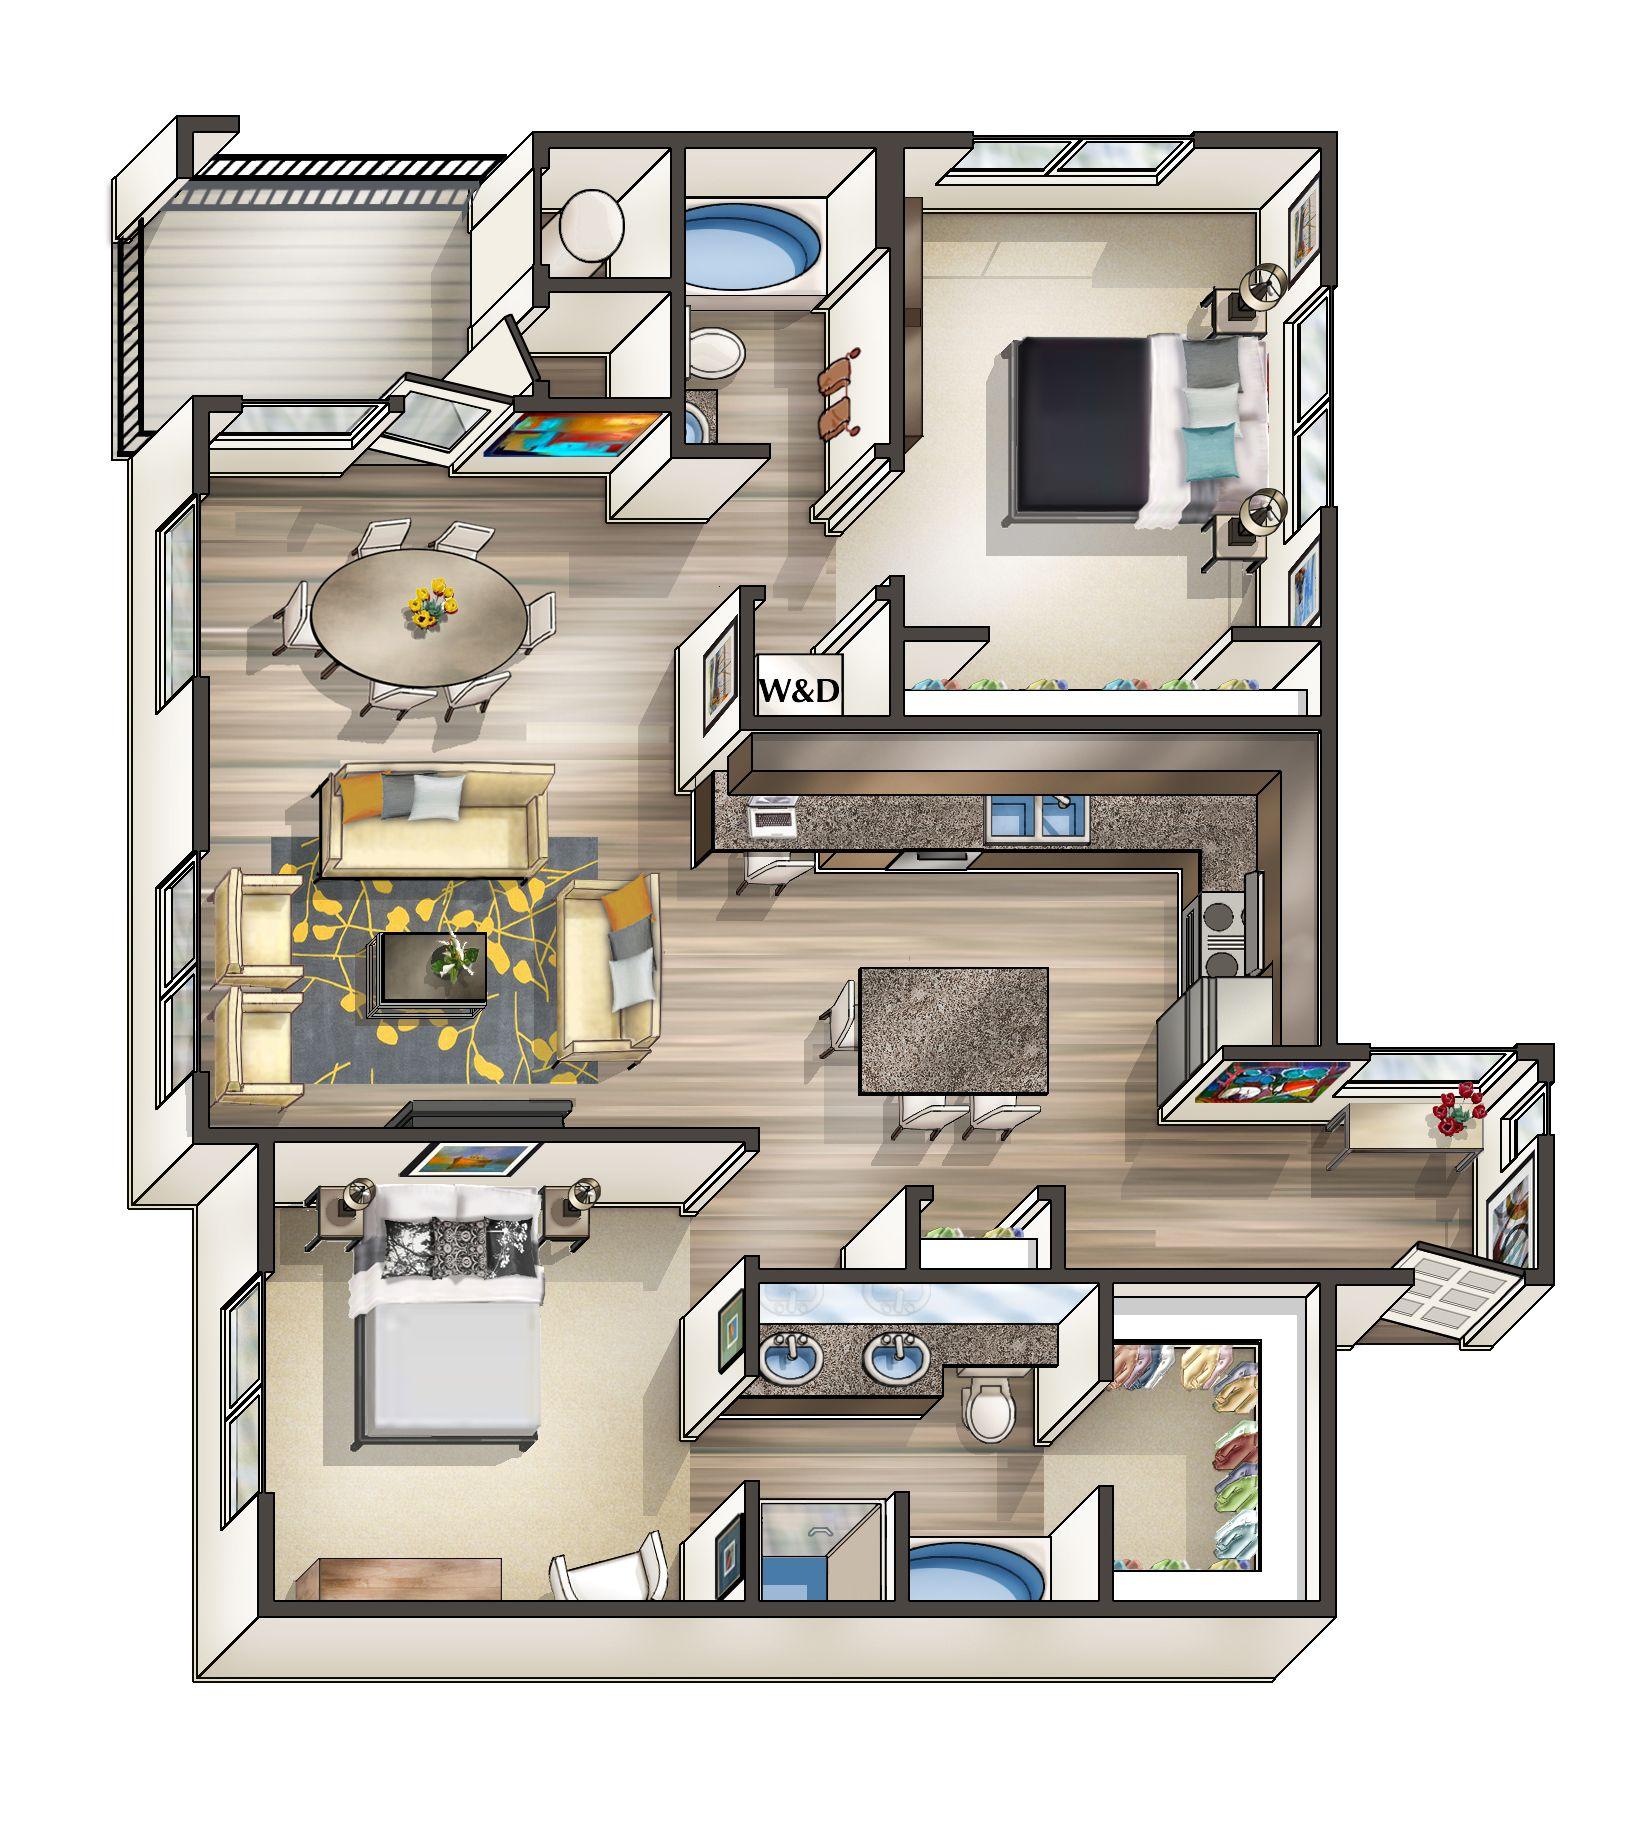 marvelous design inspiration tiny home floorplans. 500 sq ft house plans 2 bedrooms  Google Search Floor Plans